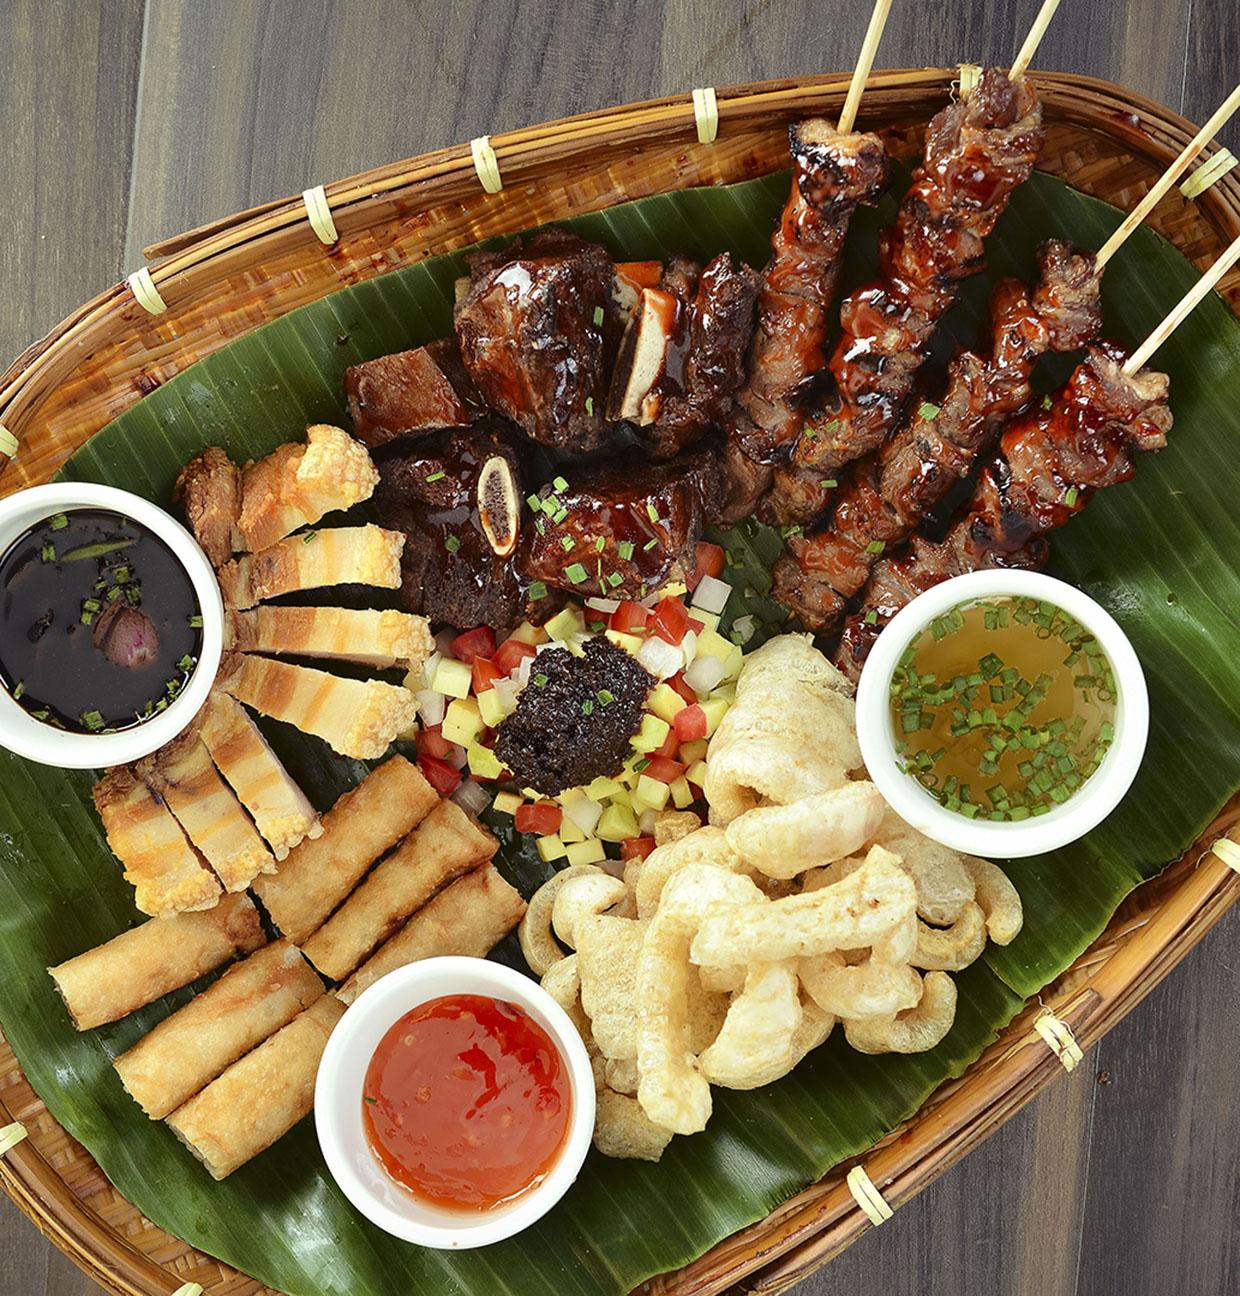 C2's Meat Platter